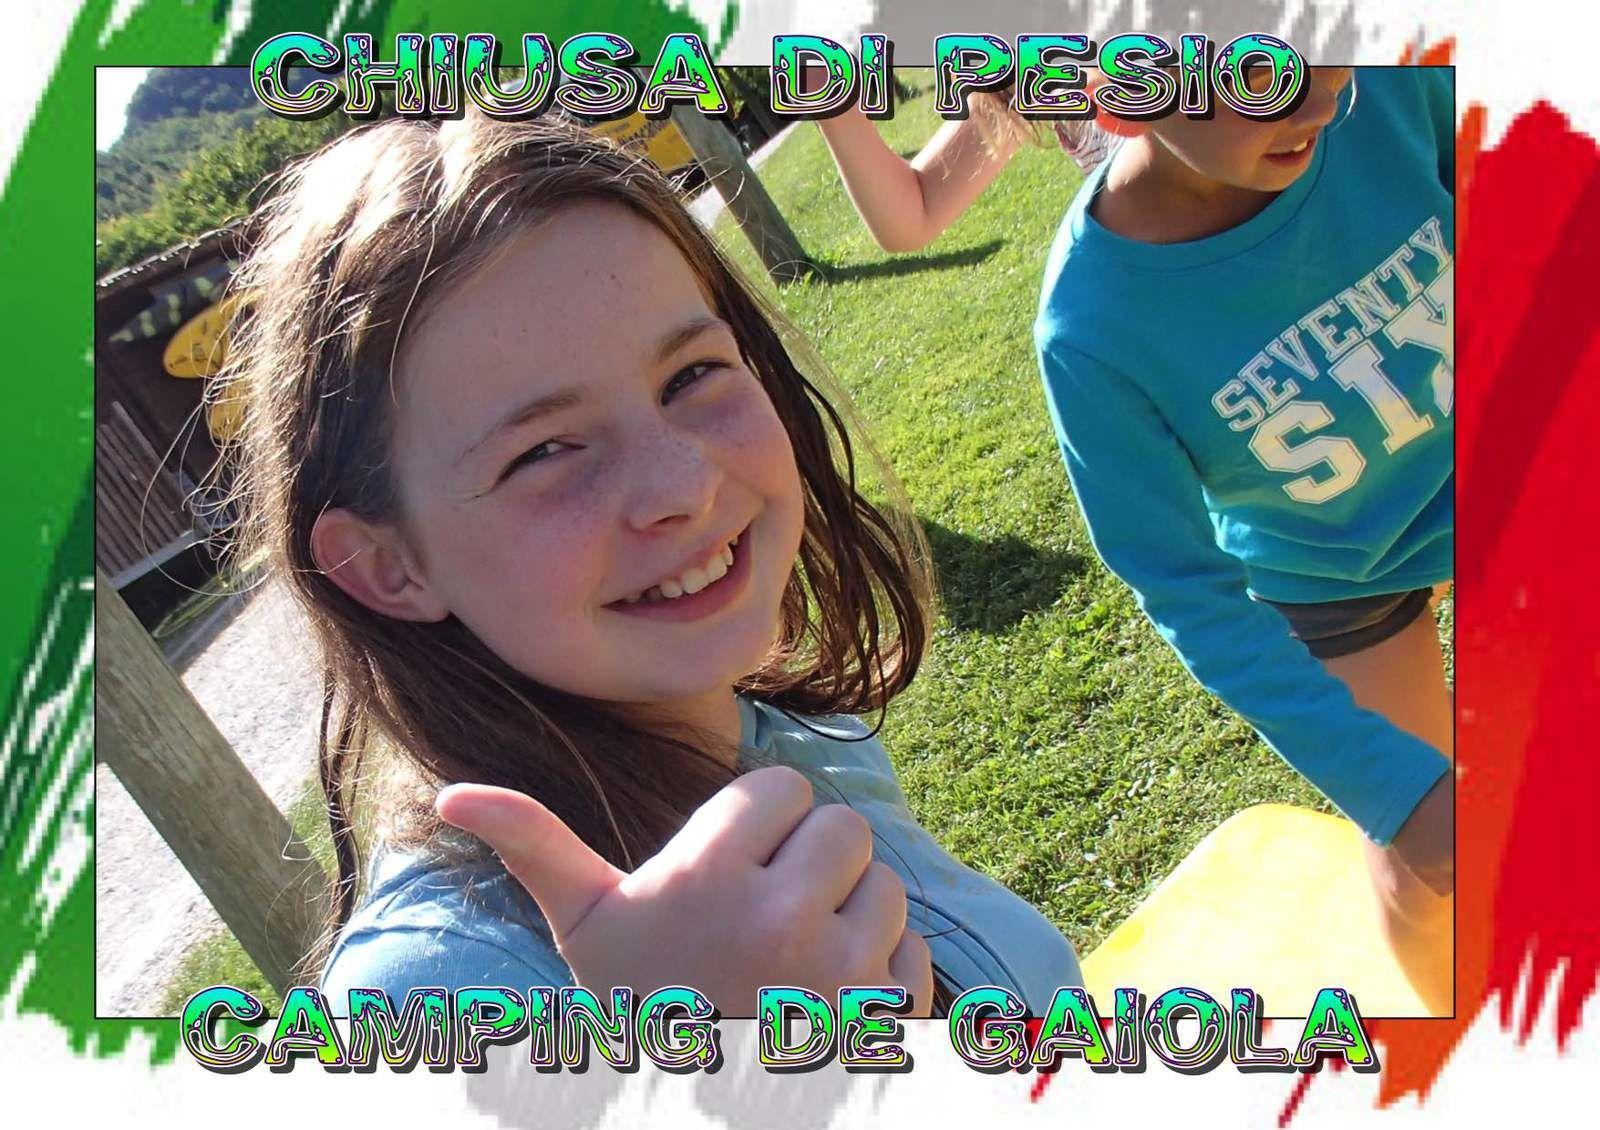 Les Enfants au Camping de Gaiola.